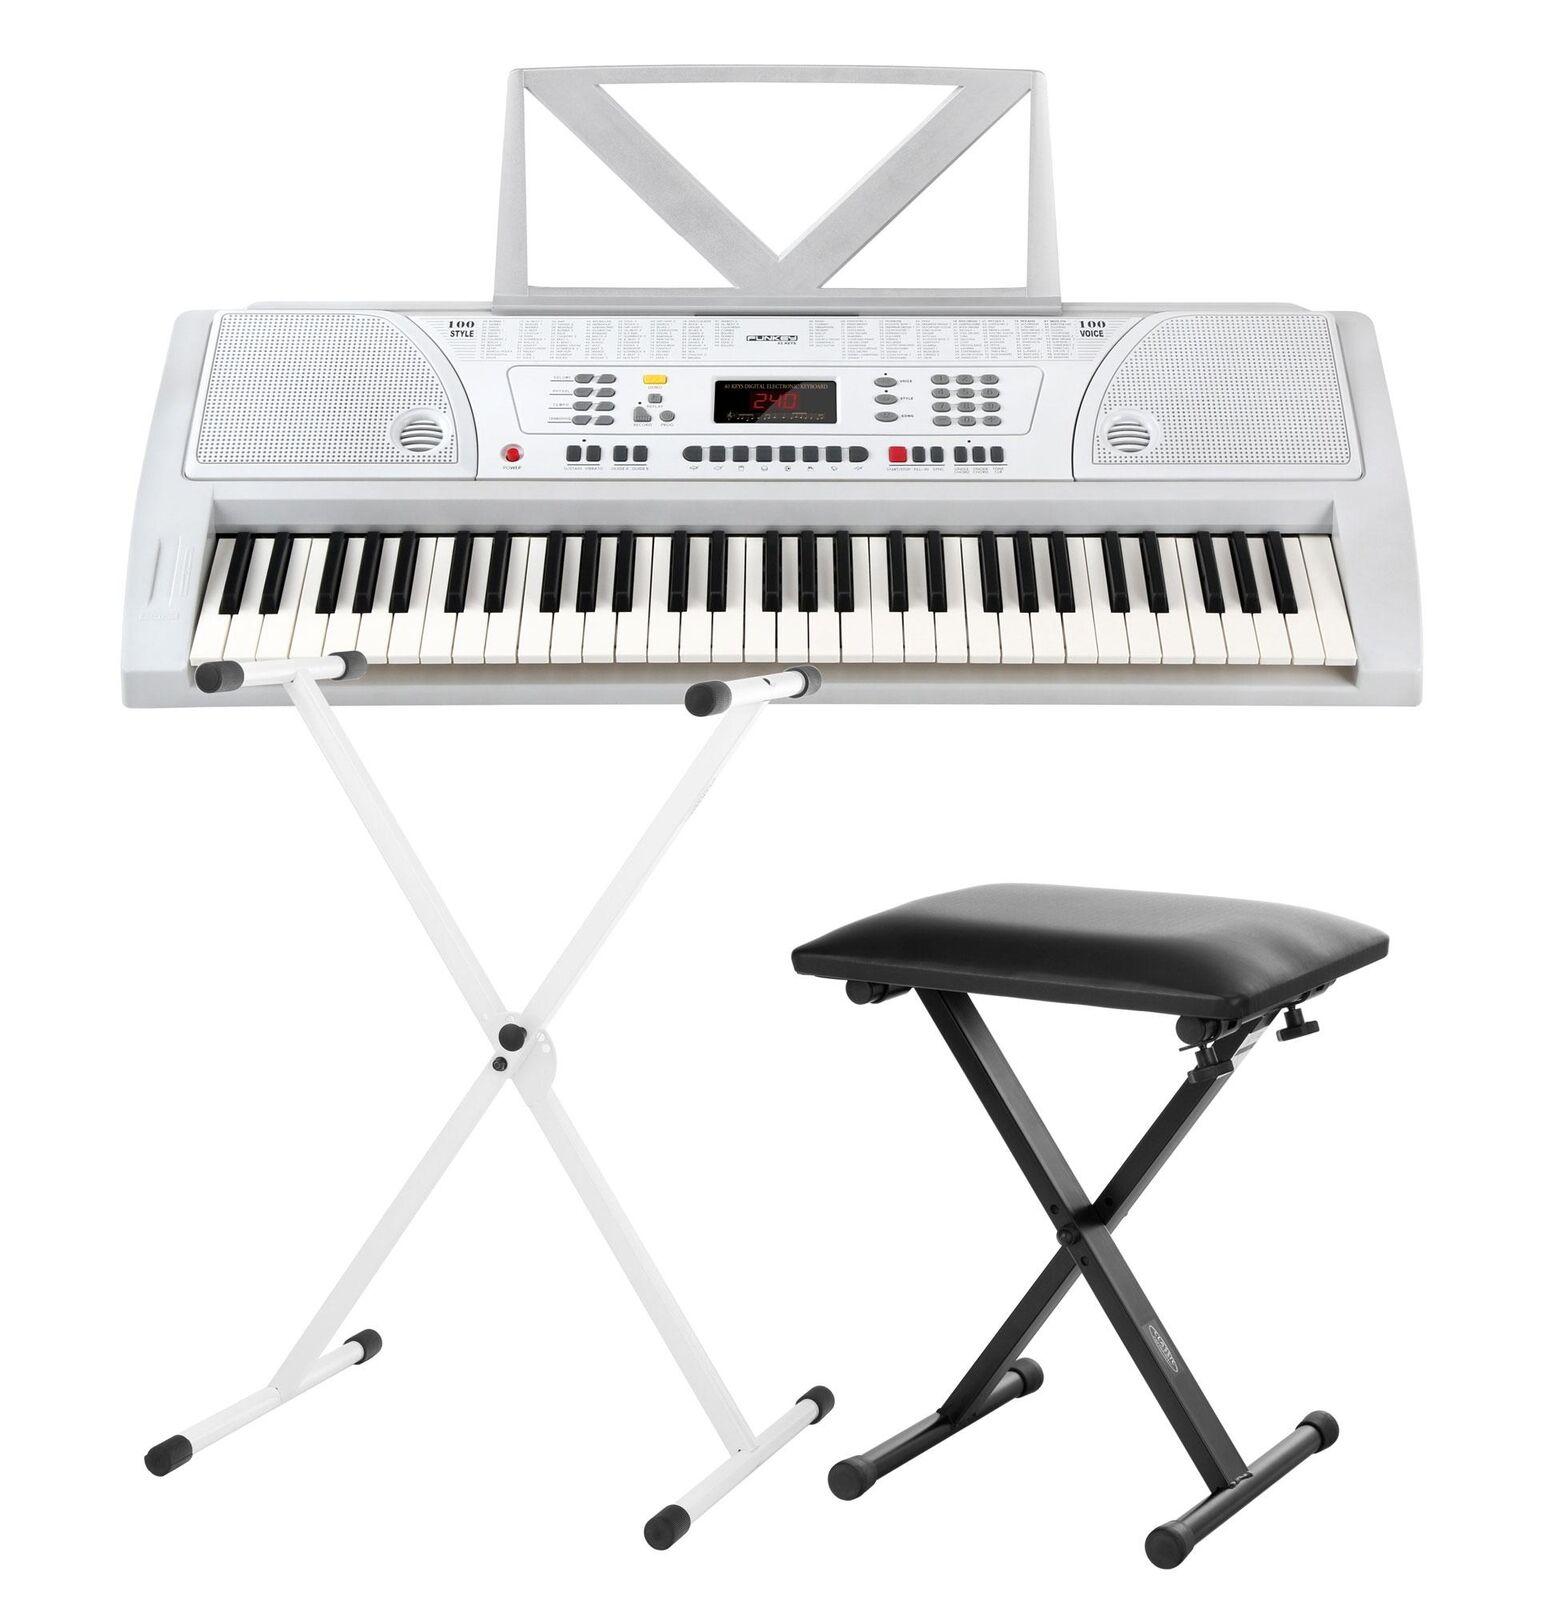 Elegante bianca Digital Keyboard 61 tasti Alimentatore nel Set KEYBOARD Supporto + SGABELLO